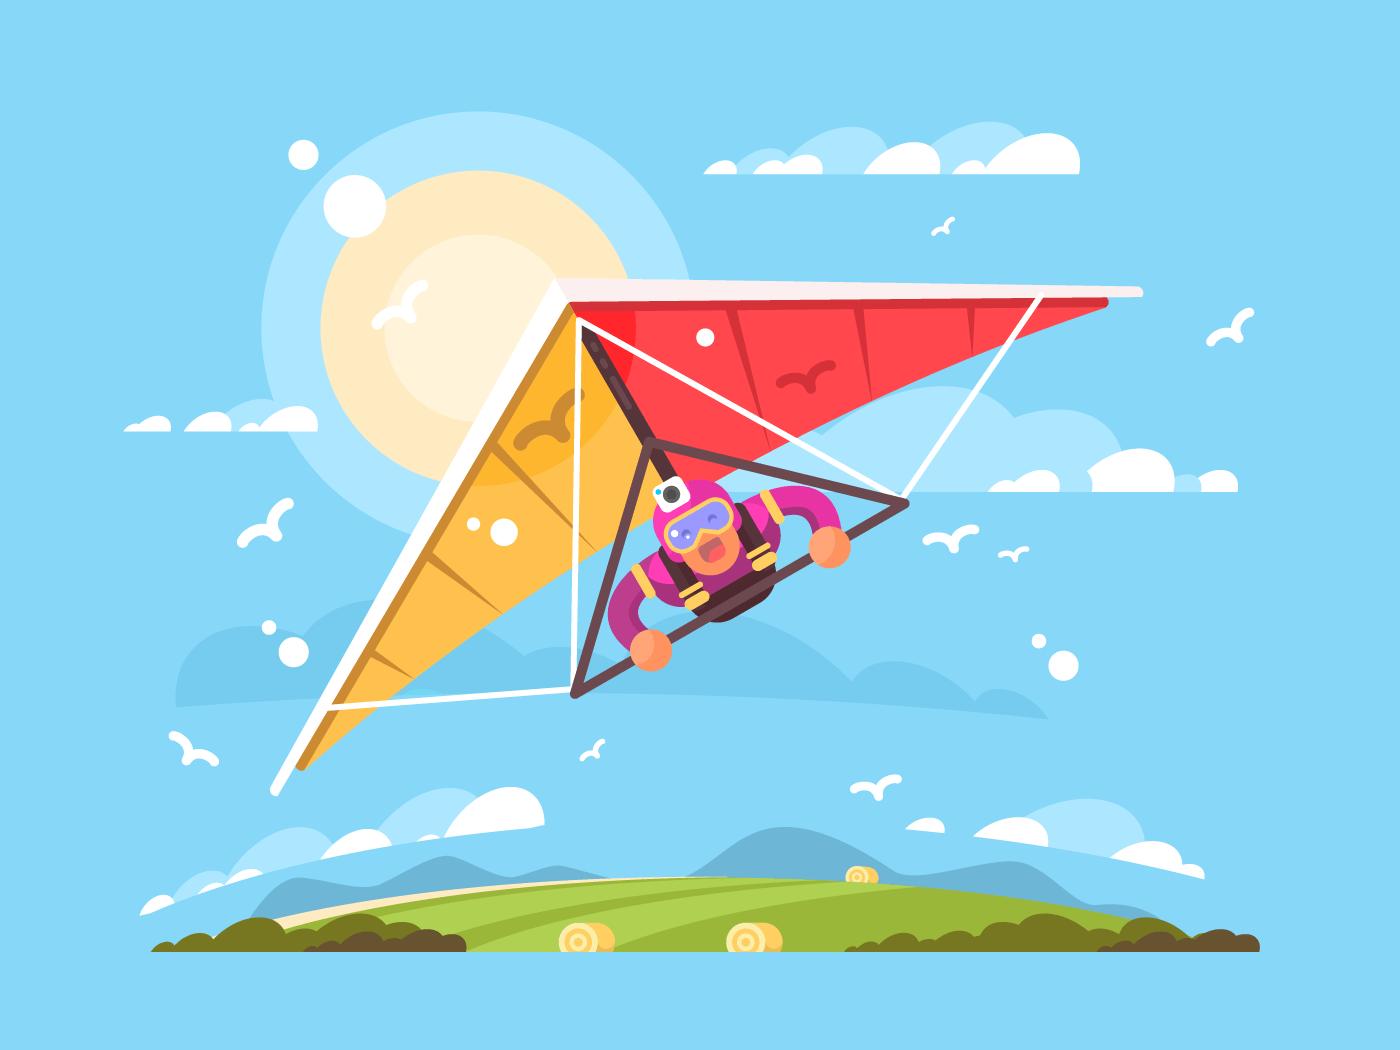 Man on a hang glider flat vector illustration